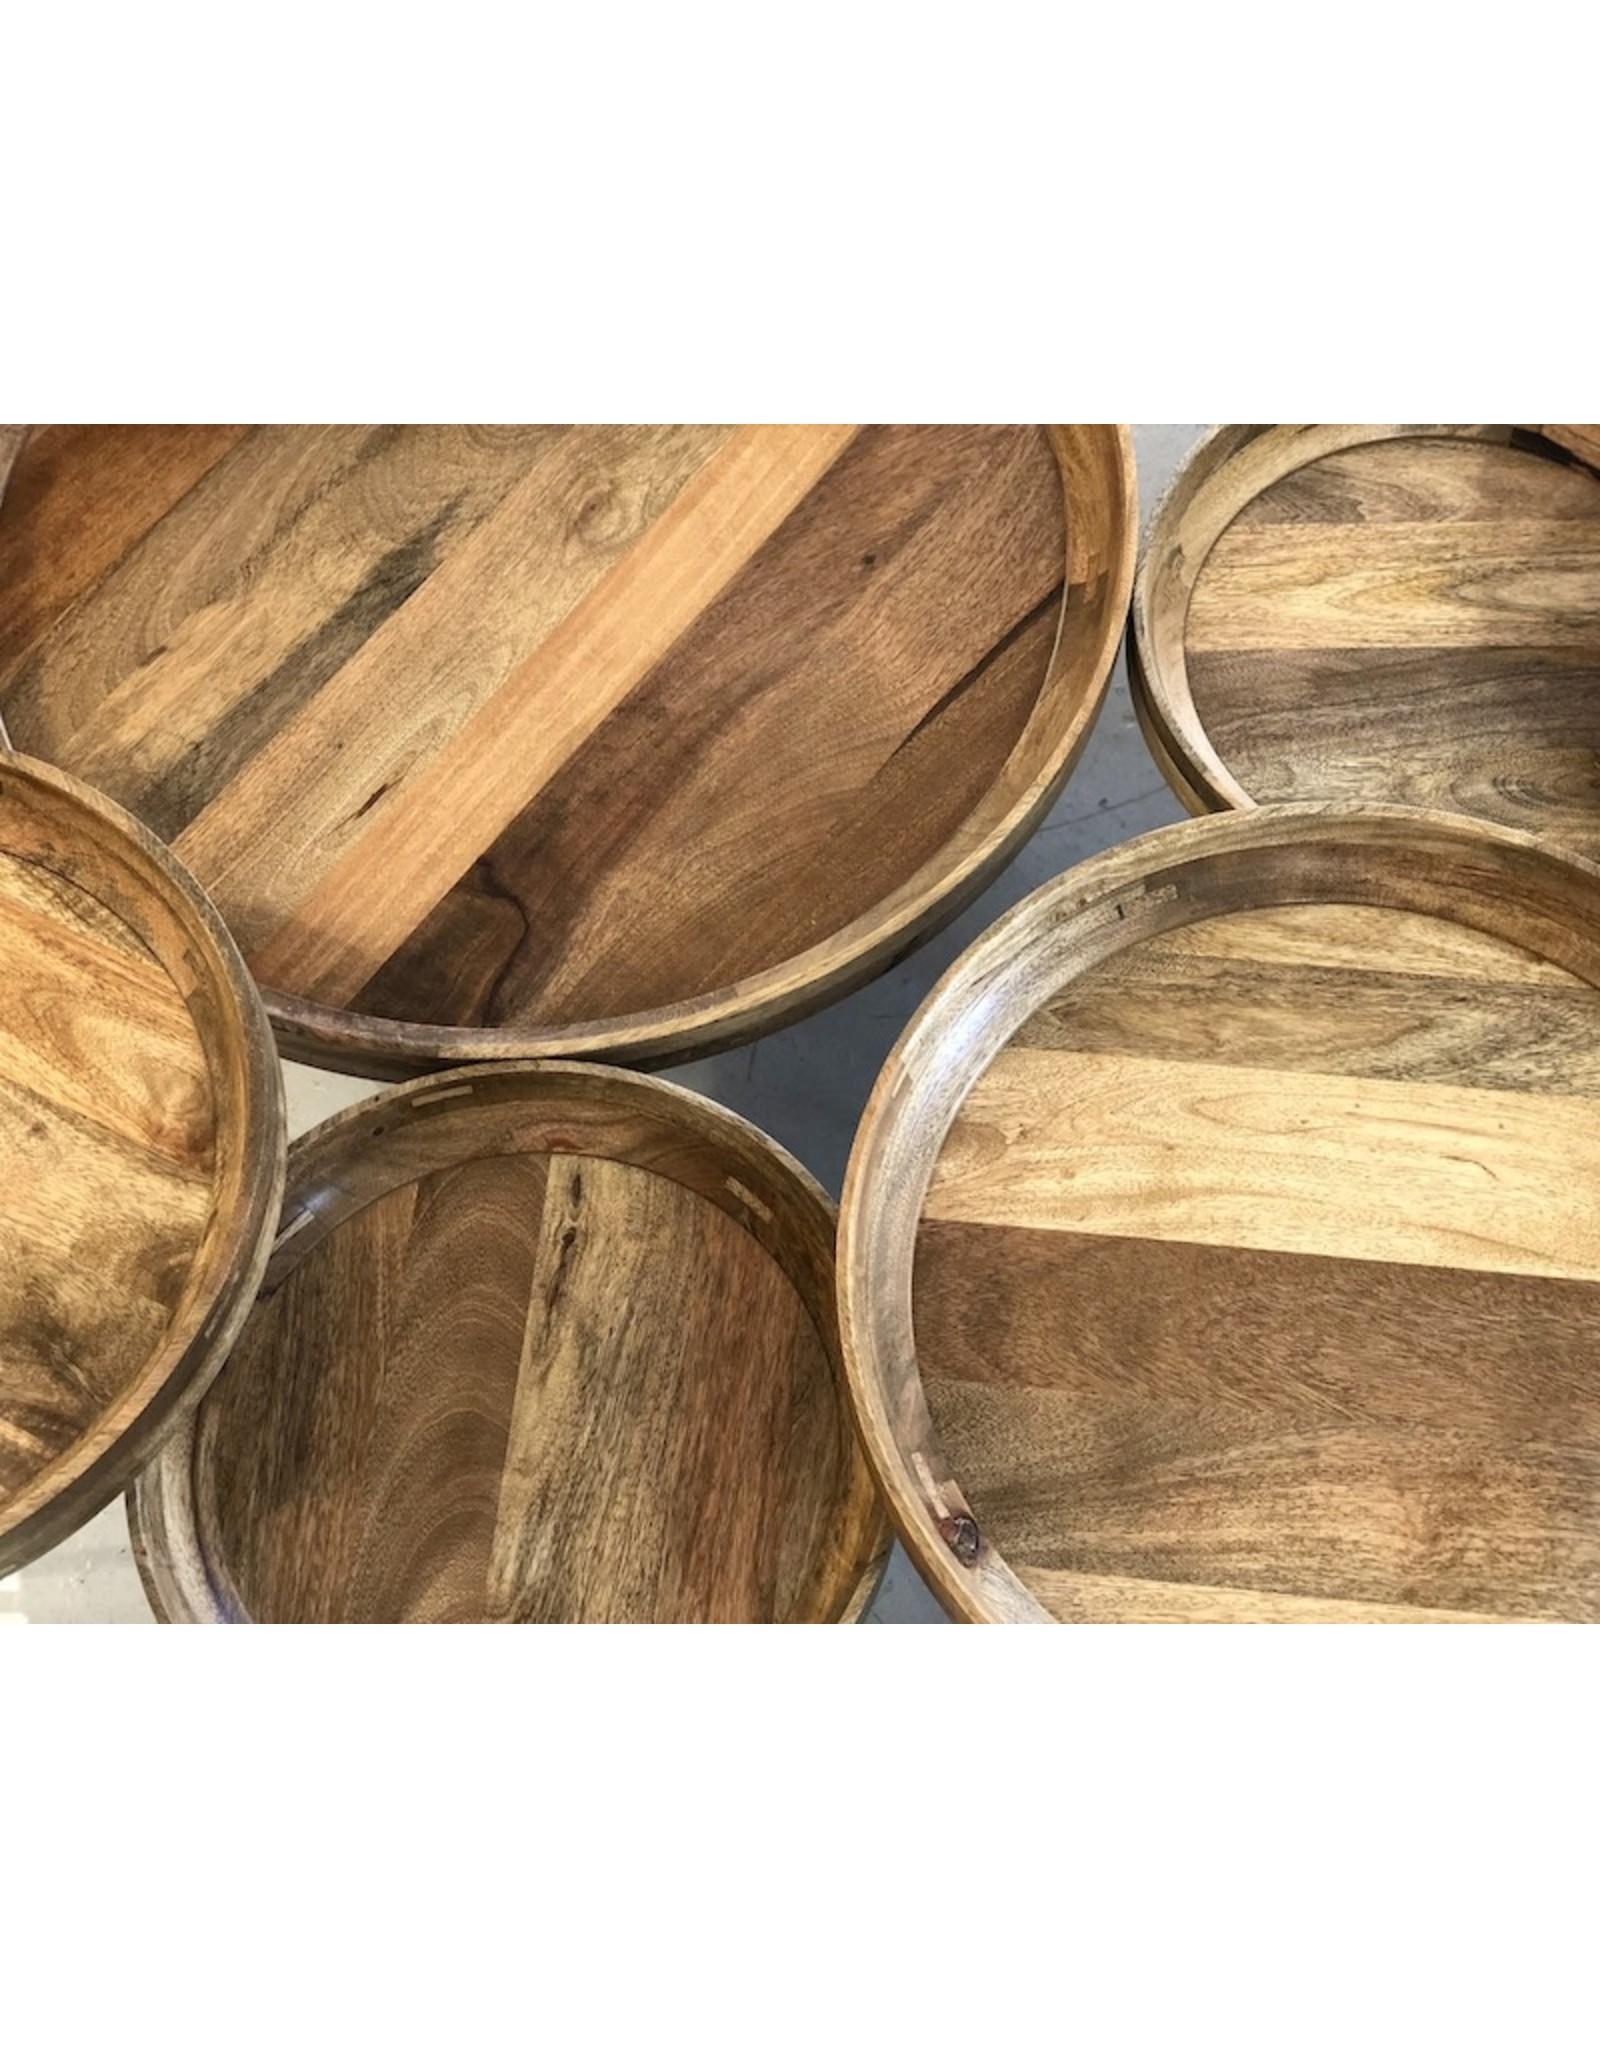 MATER MANGO BOWL TABLE IN NATURAL MANGO WOOD FINISH